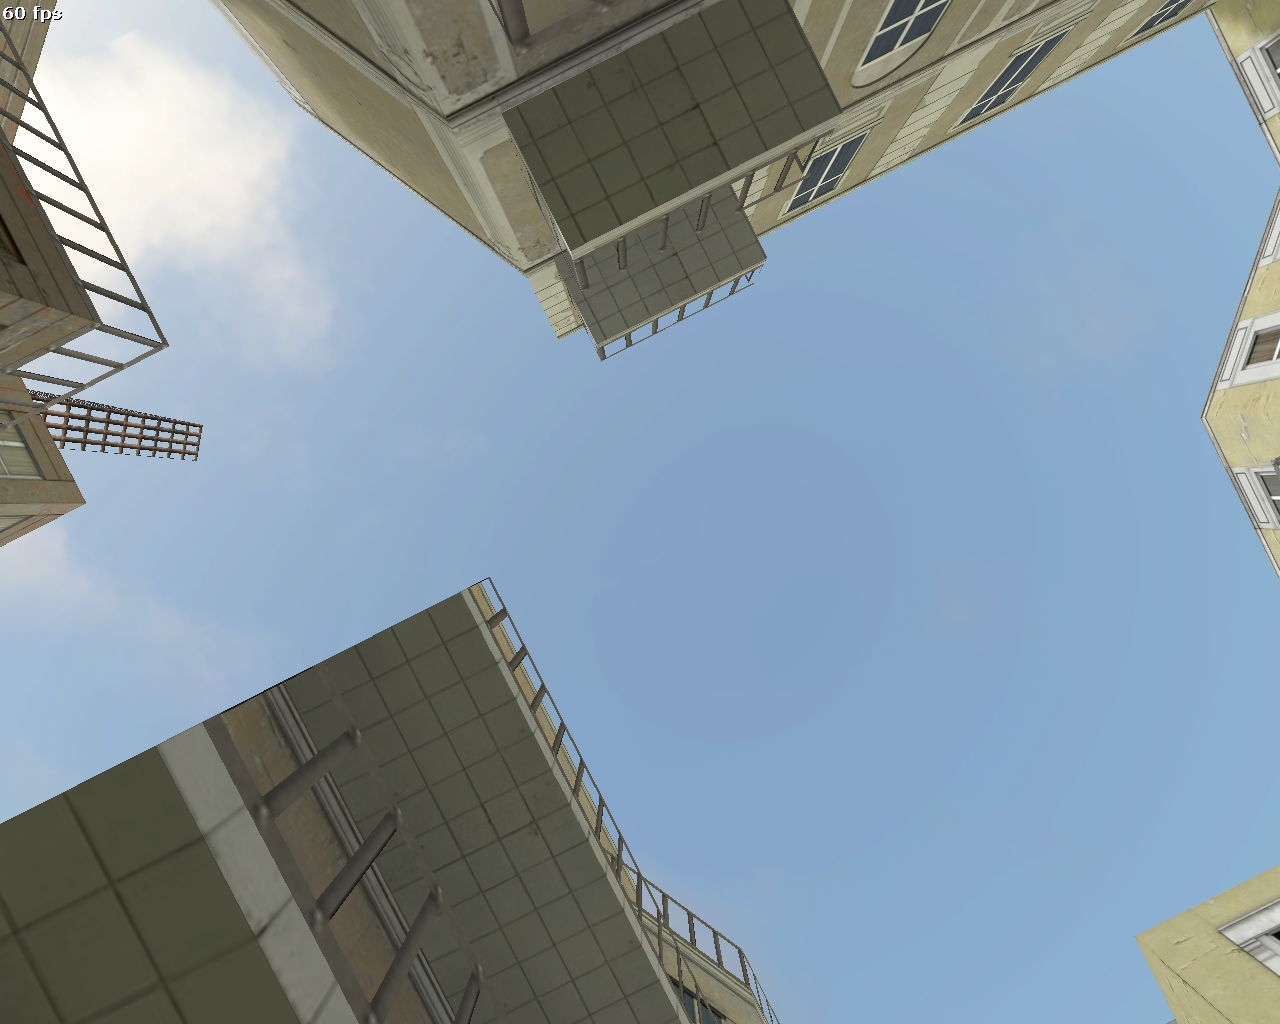 aim_city2 - Counter-Strike